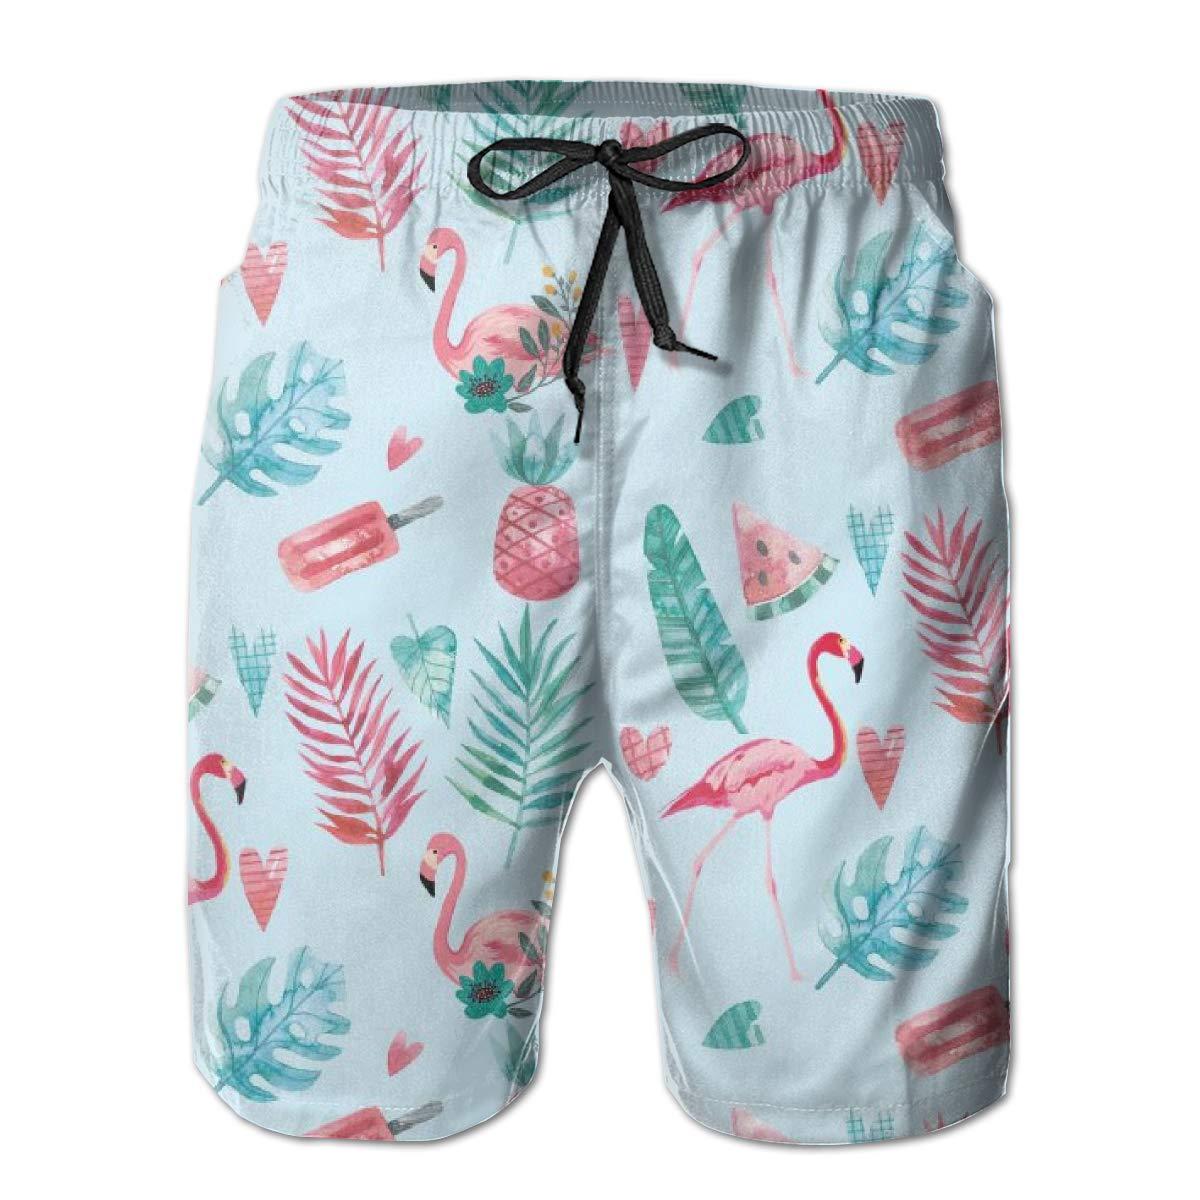 3D Swimming Trunks Board Shorts for Men Galaxy Voyage Flamingo Bird Boy Mens Swim Trunks Surf Pants